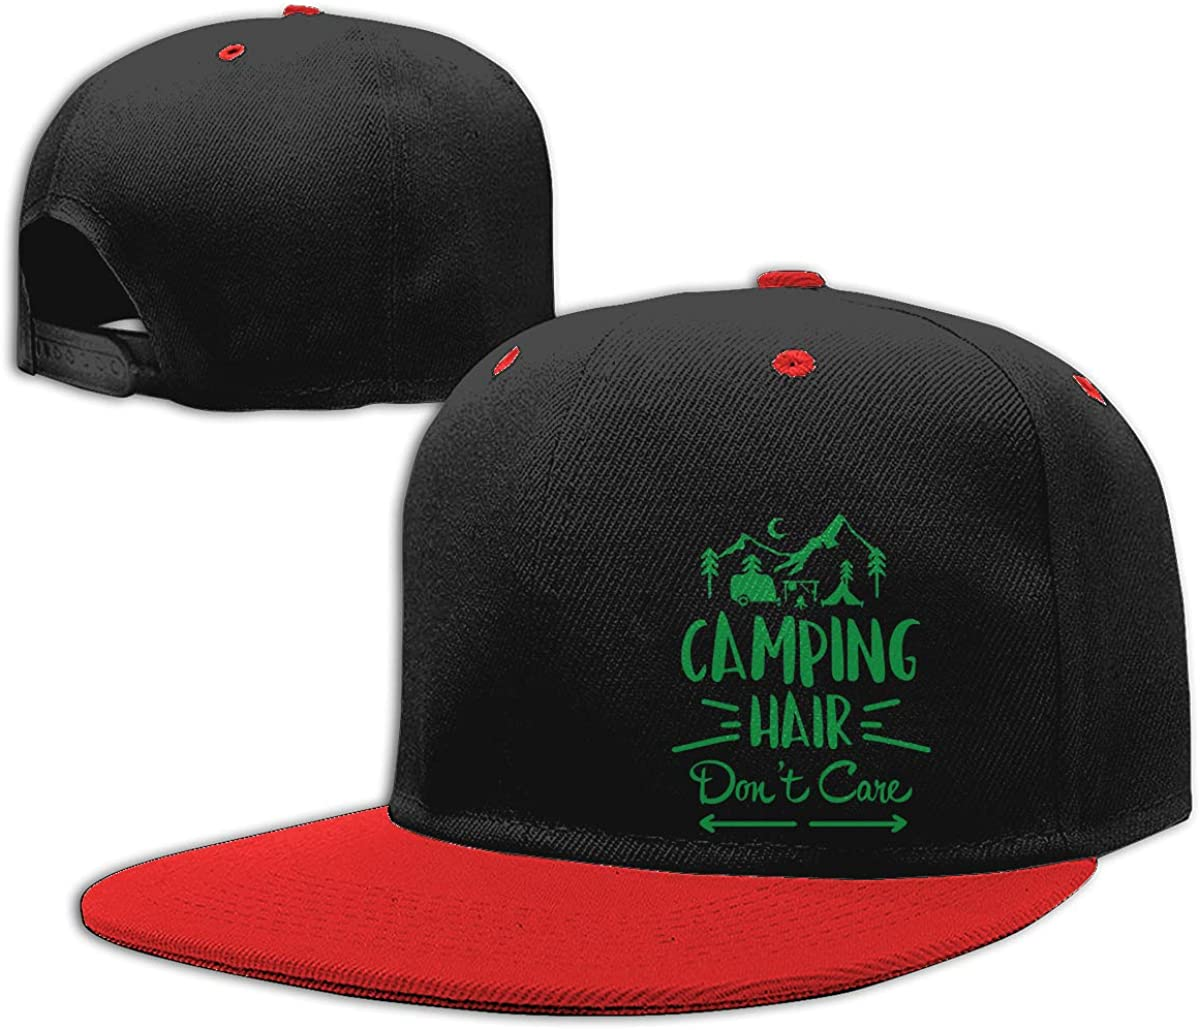 Camp Hair Dont Care1-1 Adults Hip-Hop Baseball Caps NMG-01 Women Men Plain Cap